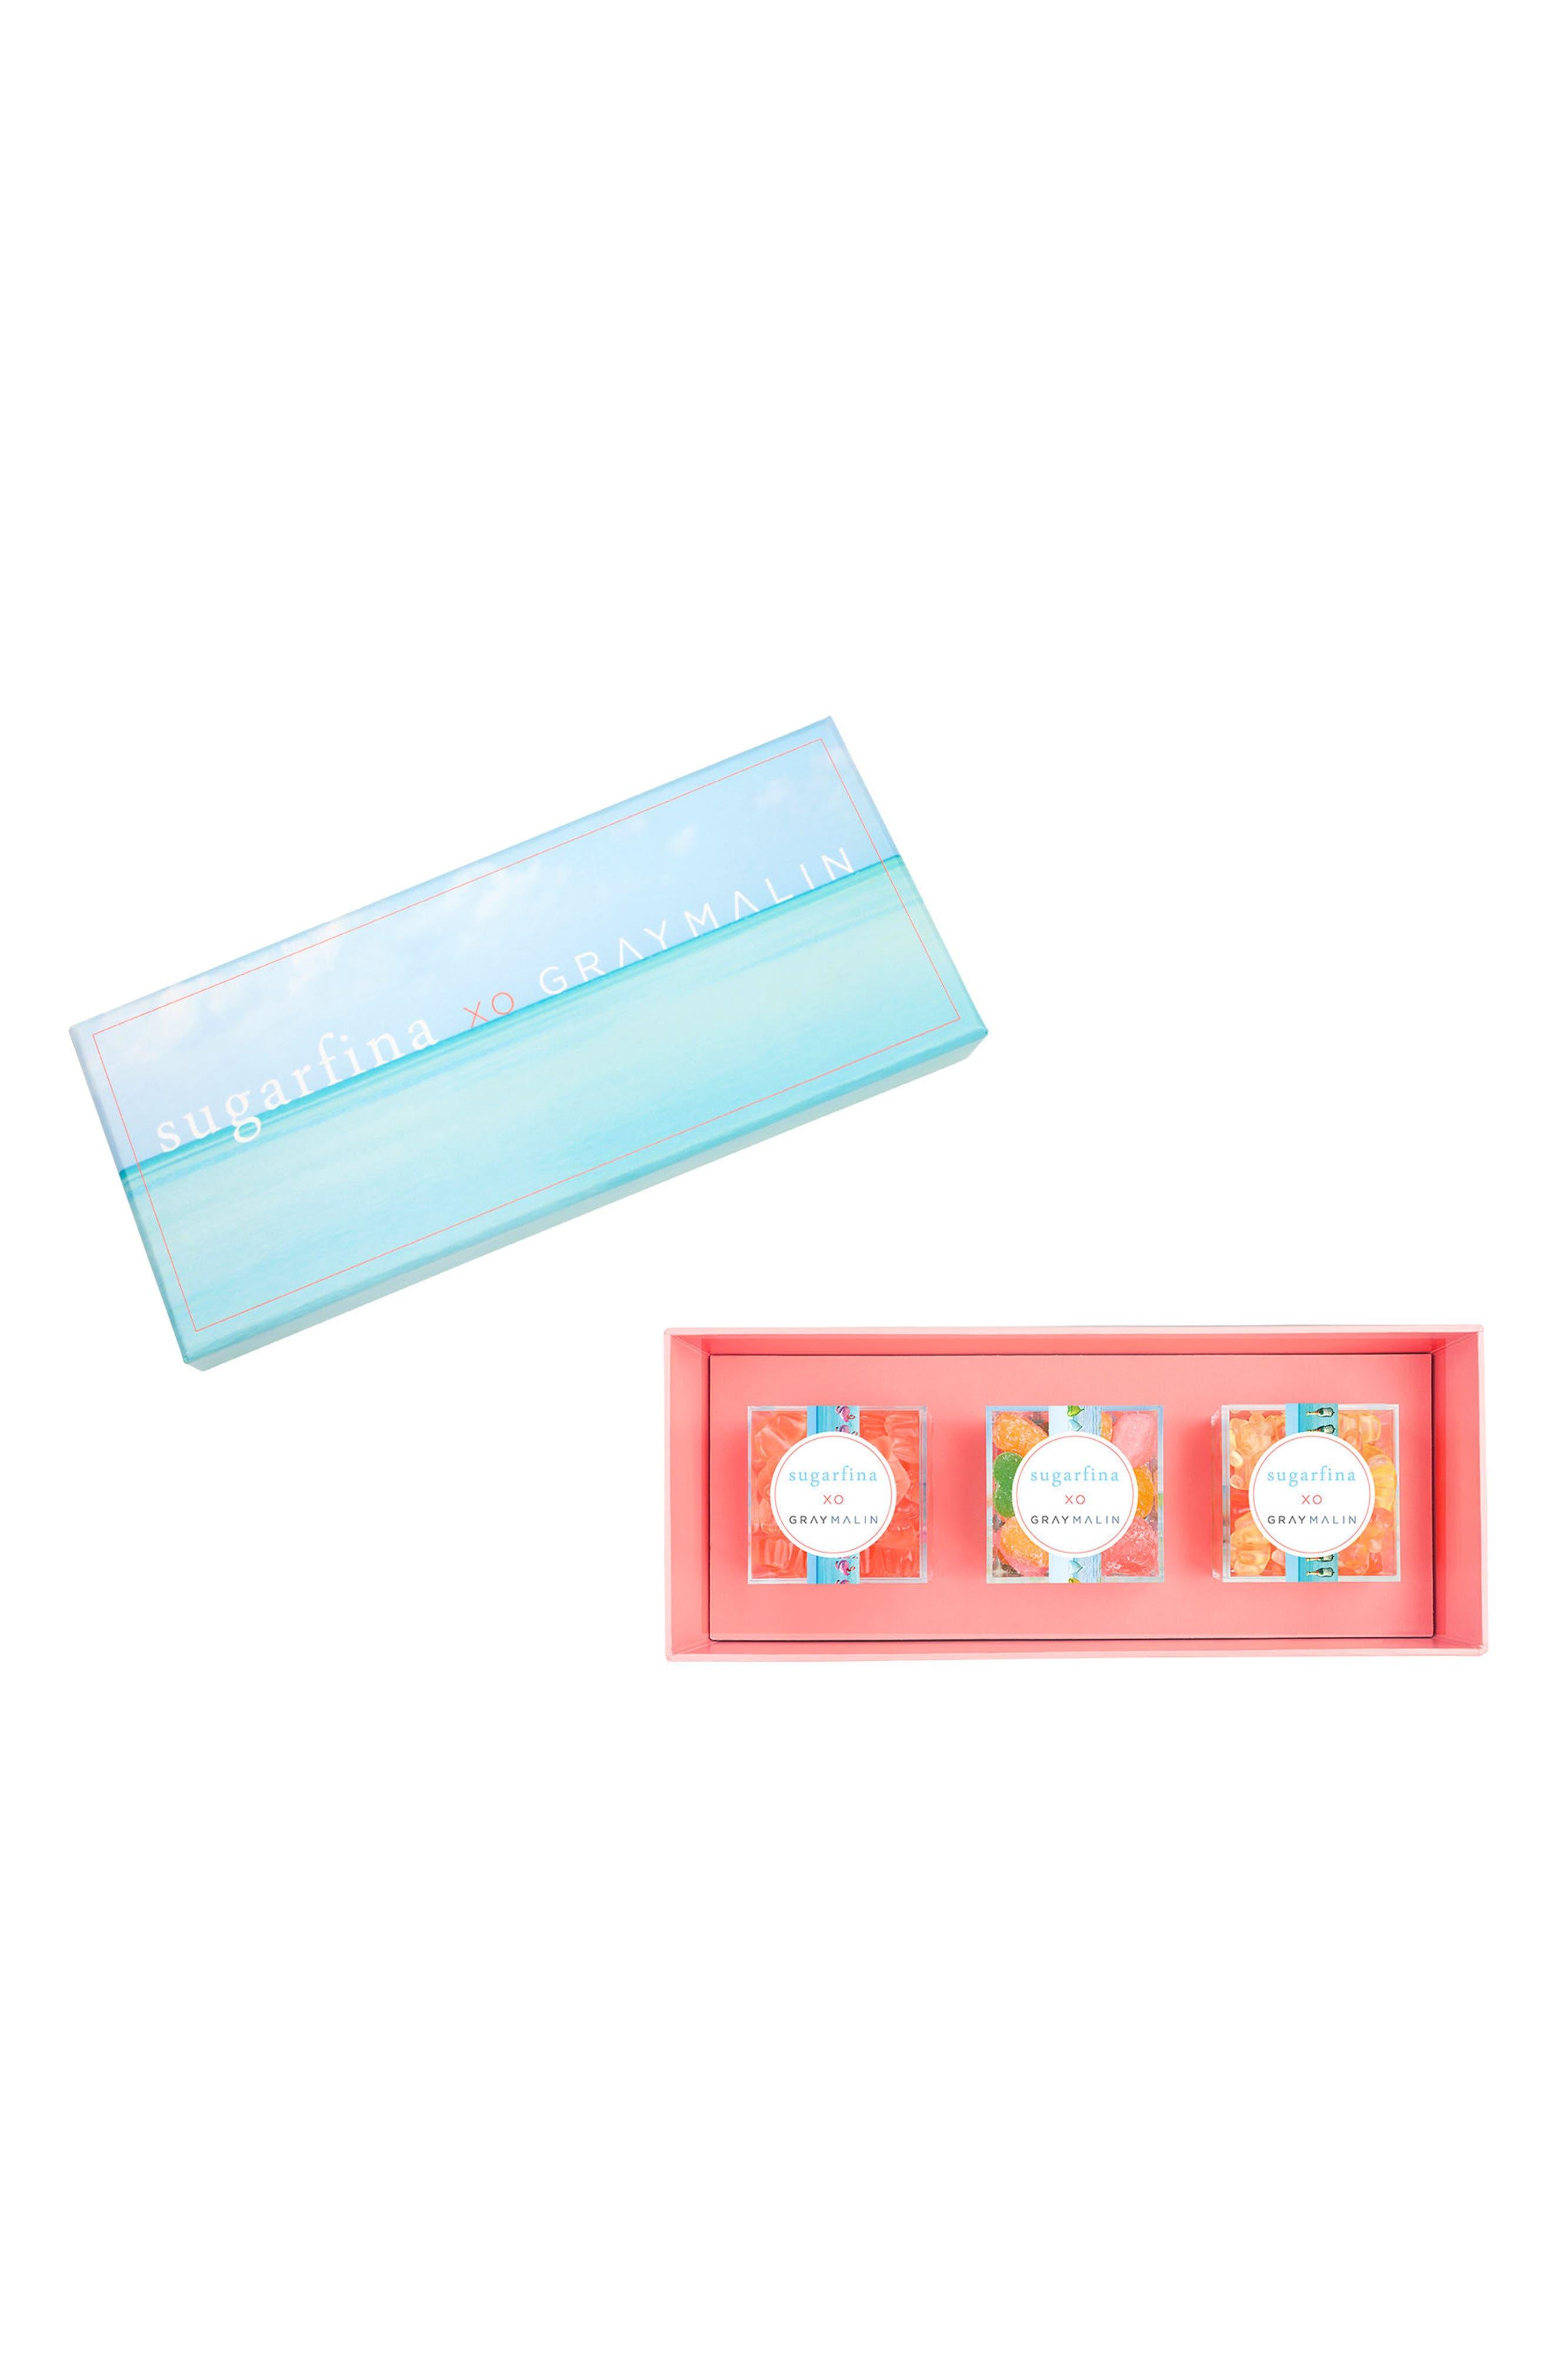 sugarfina x Gray Malin 3-Piece Candy Bento Box